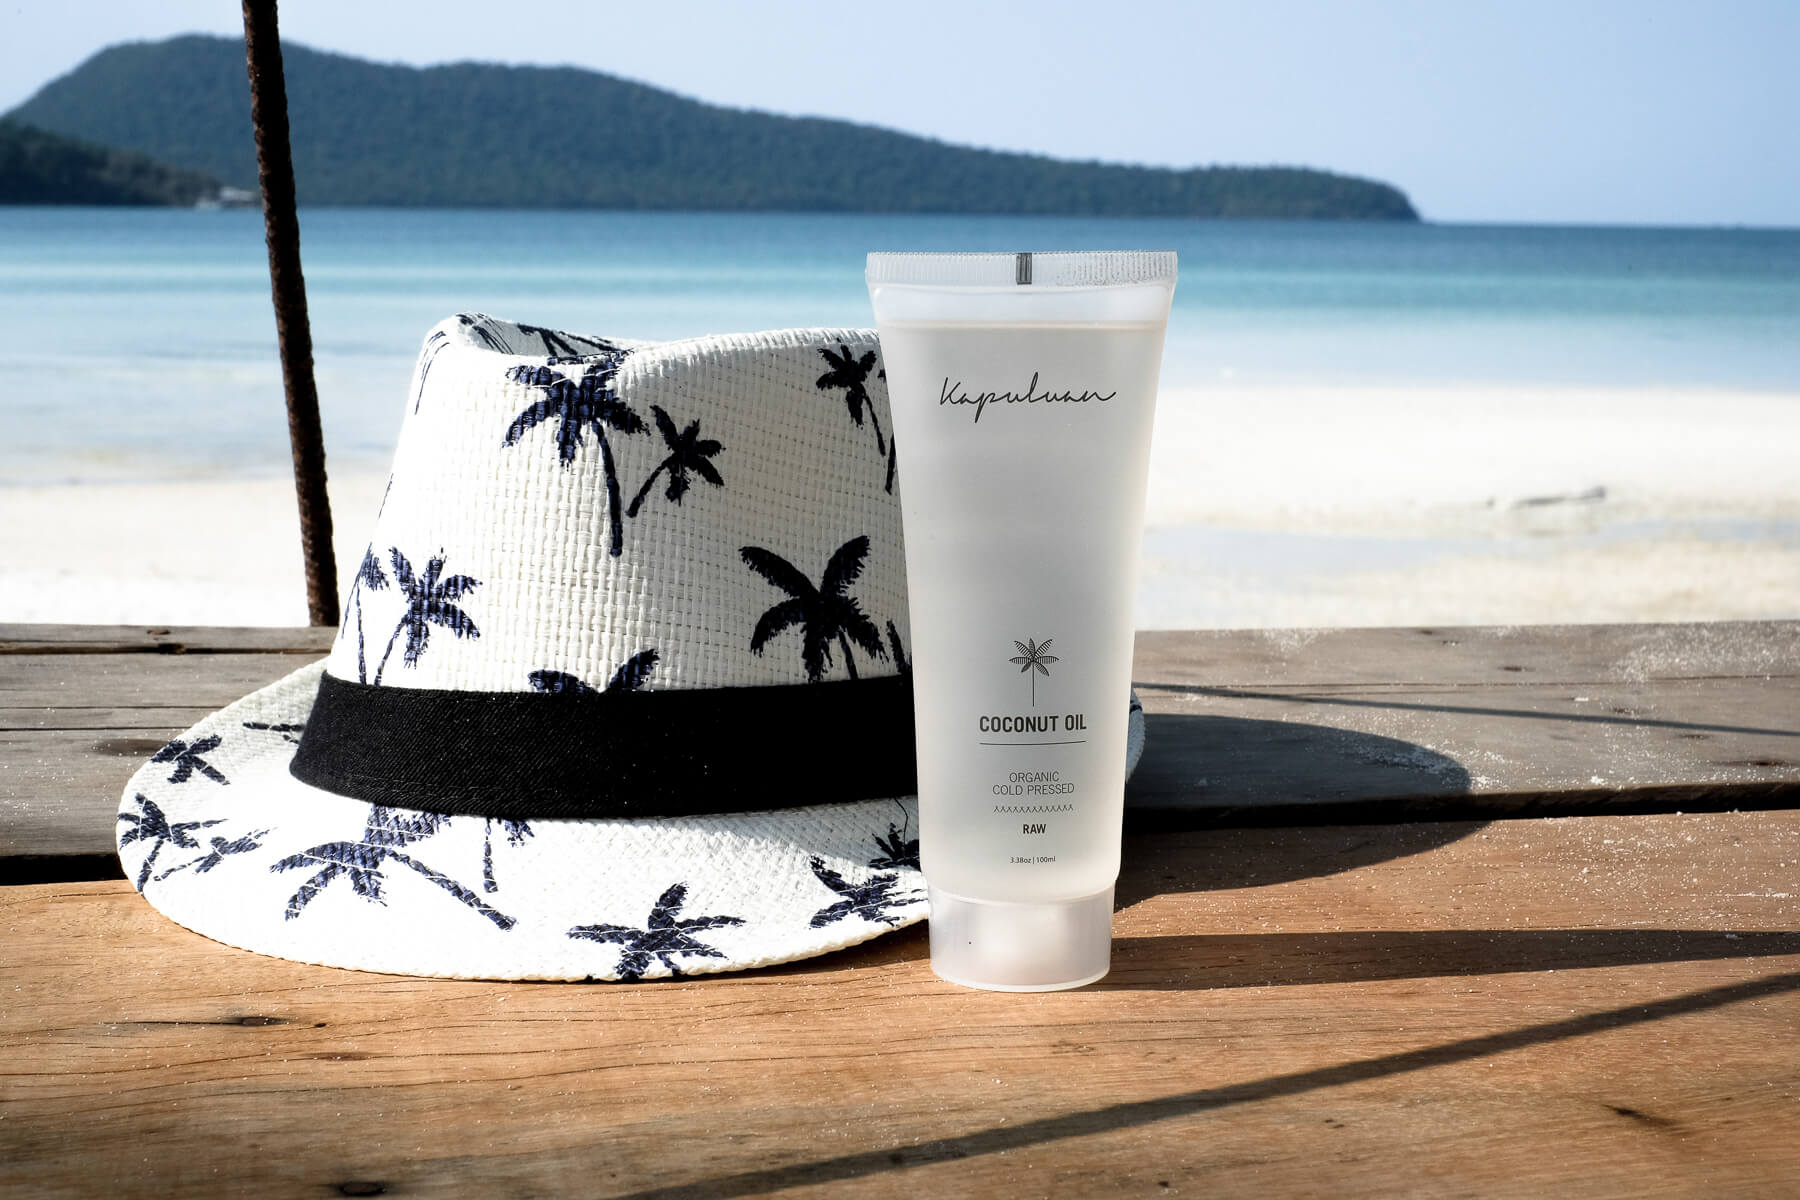 Kapuluan Coconut Oil Perfect for Travel